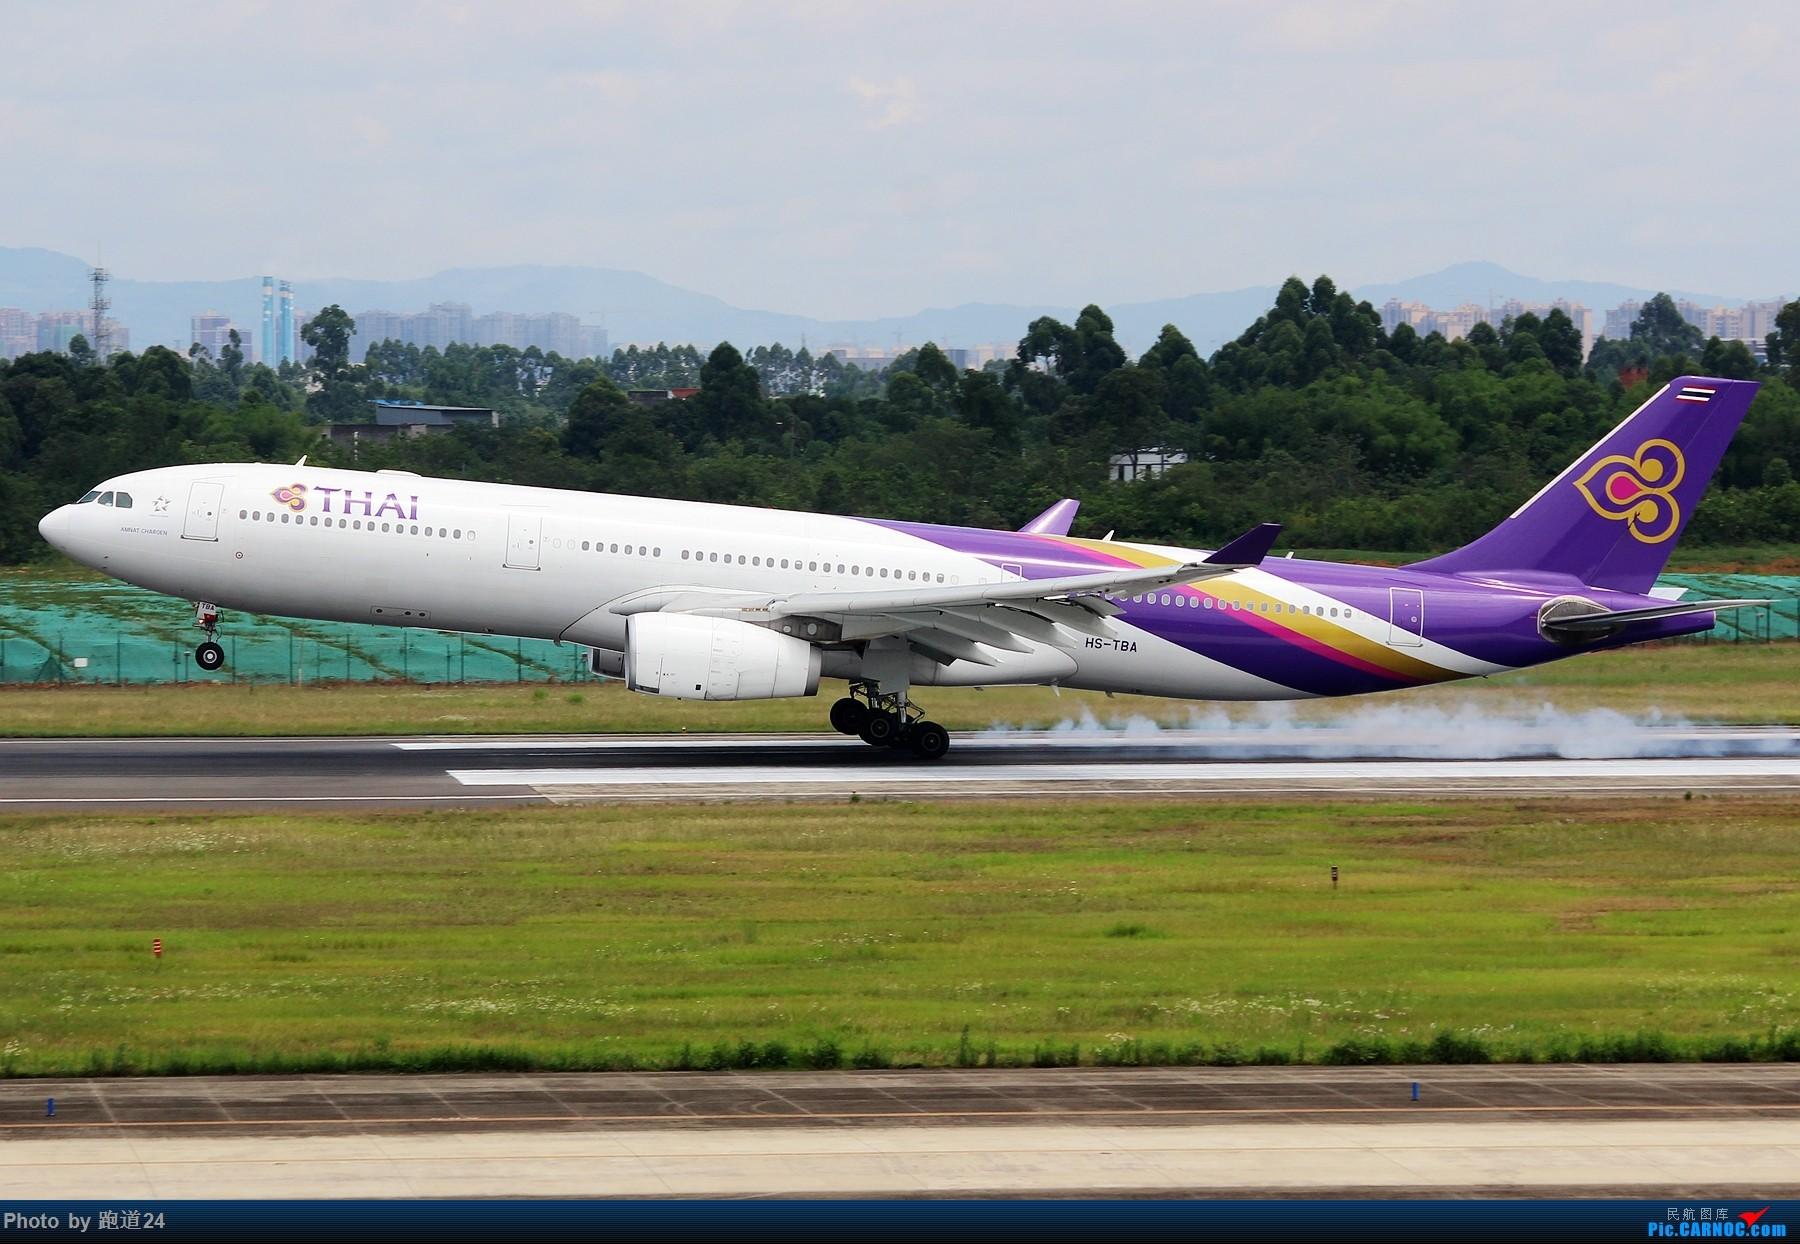 Re:[原创]【多图党】6月18日成都拍机【埃塞俄比亚航空B777-200LR】 AIRBUS A330-300 HS-TBA 中国成都双流国际机场